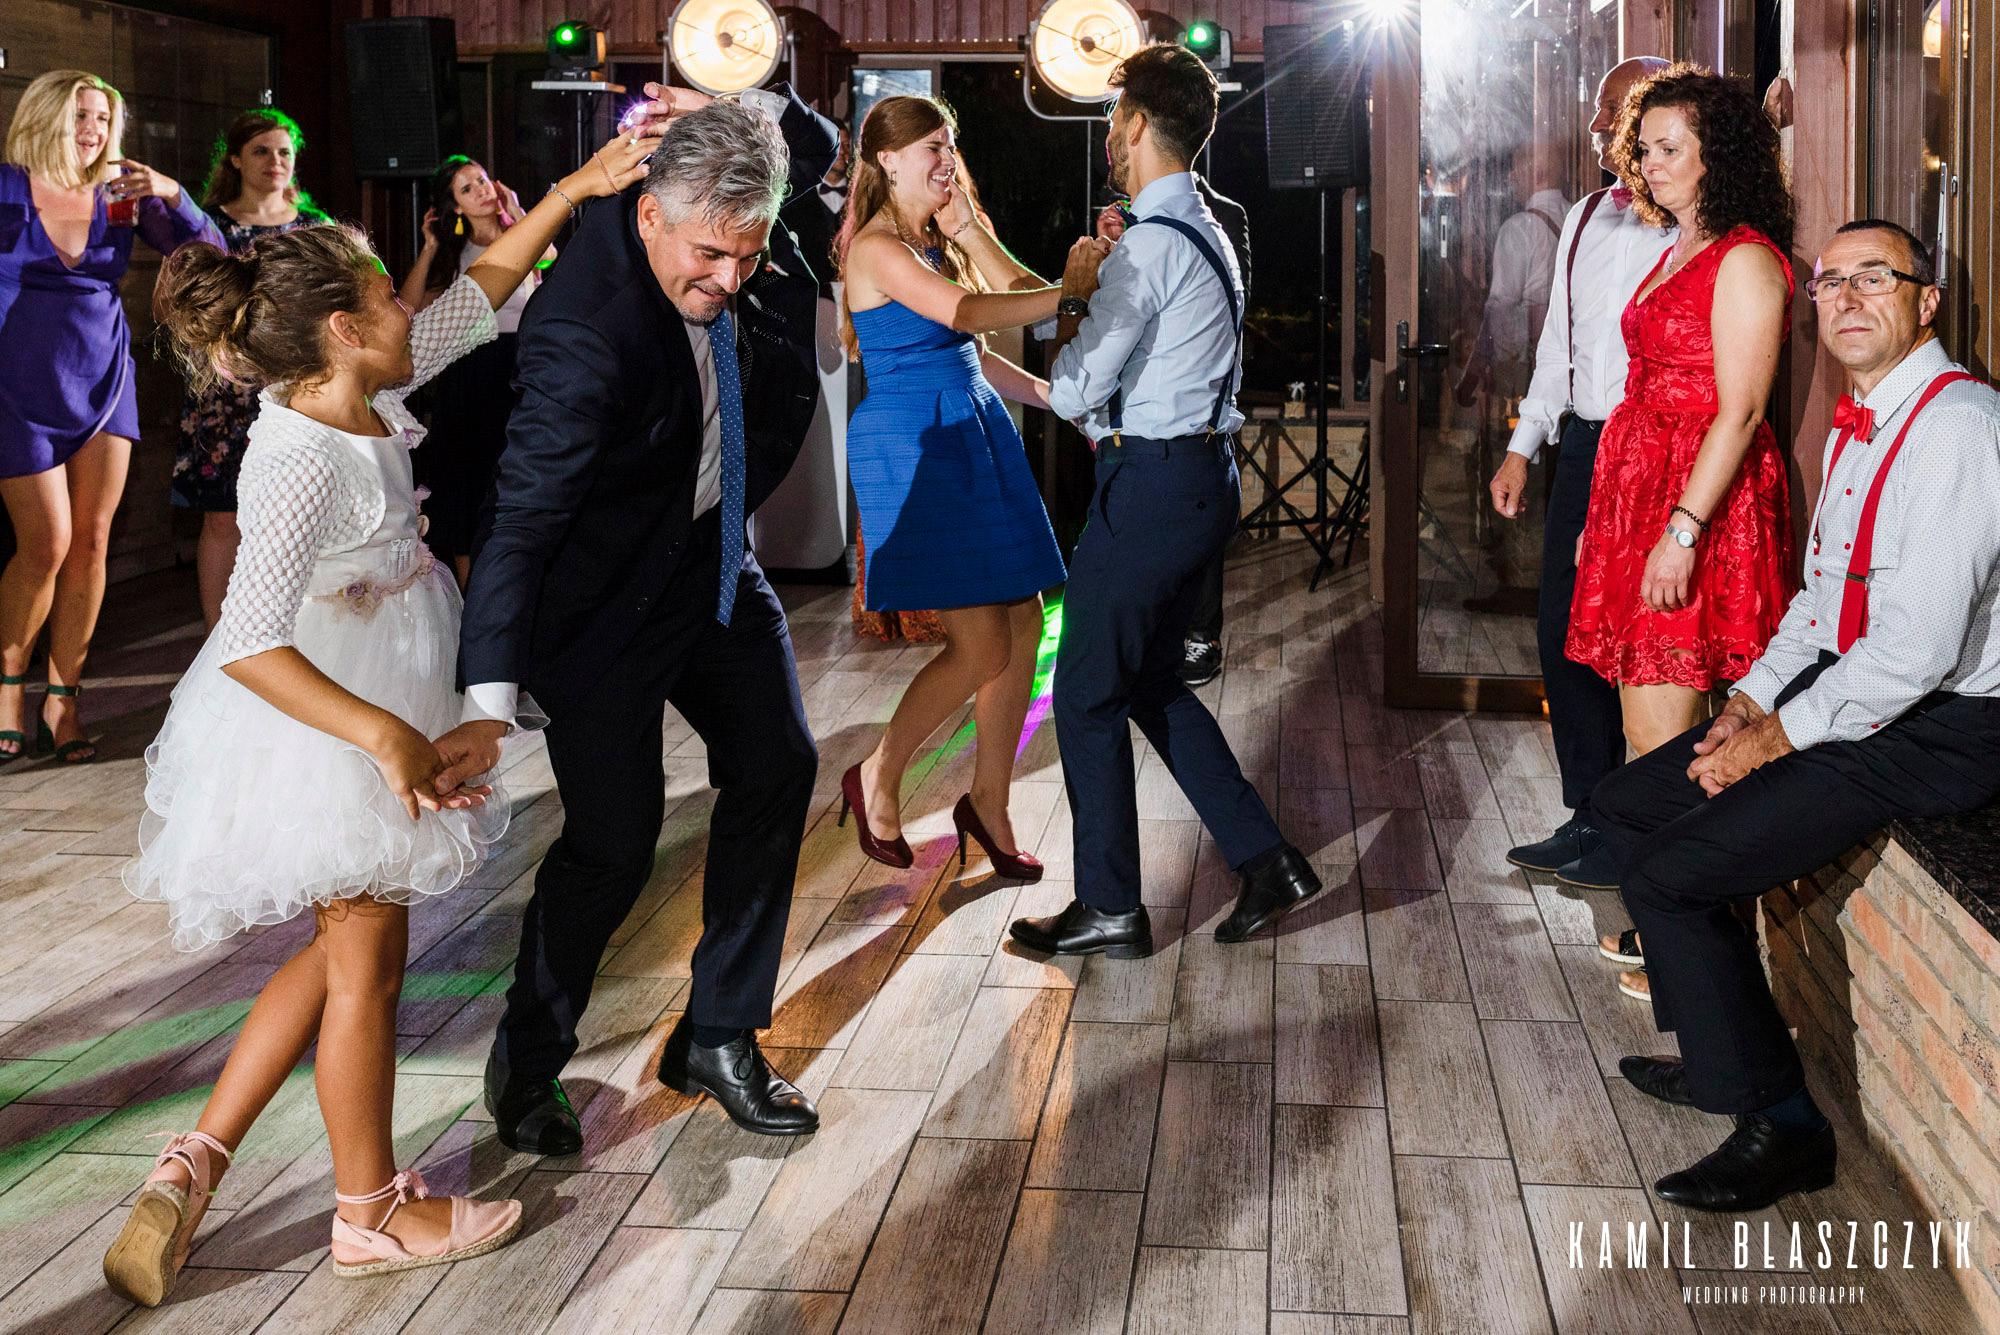 Zabawa na ślubie